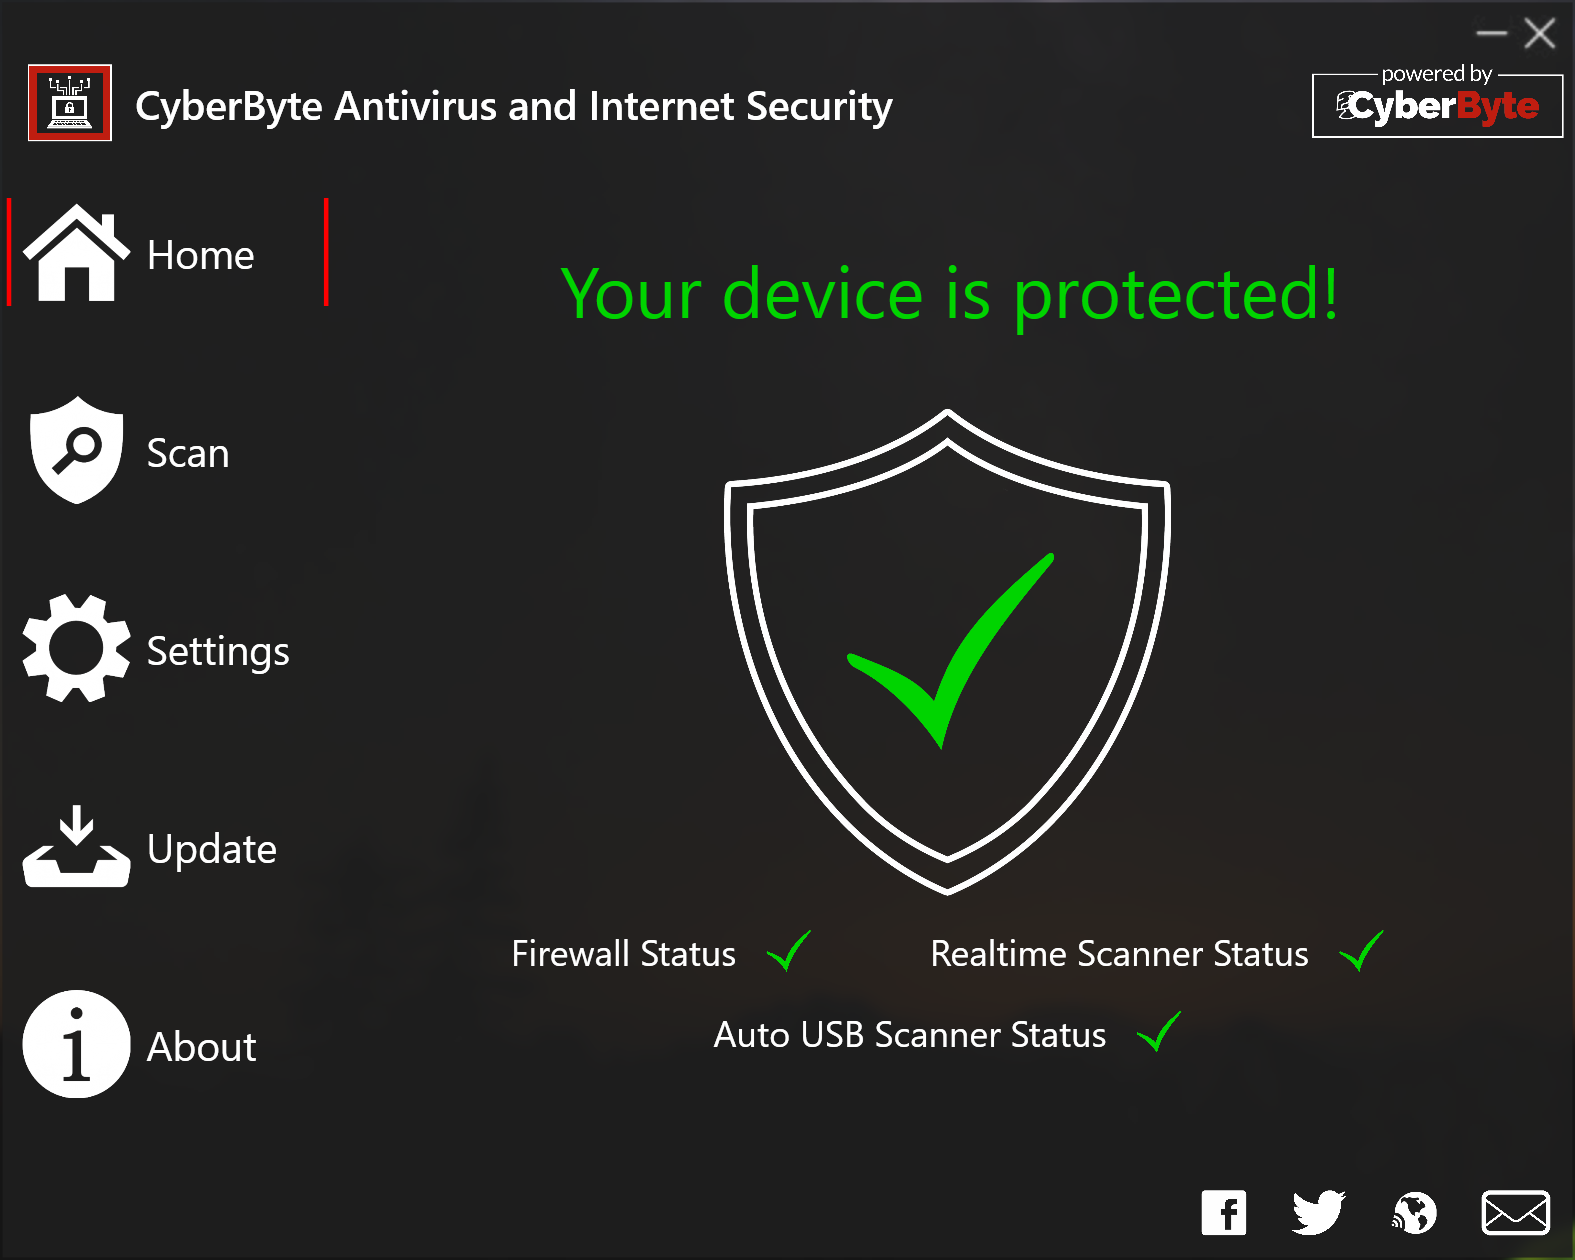 CyberByte Antivirus